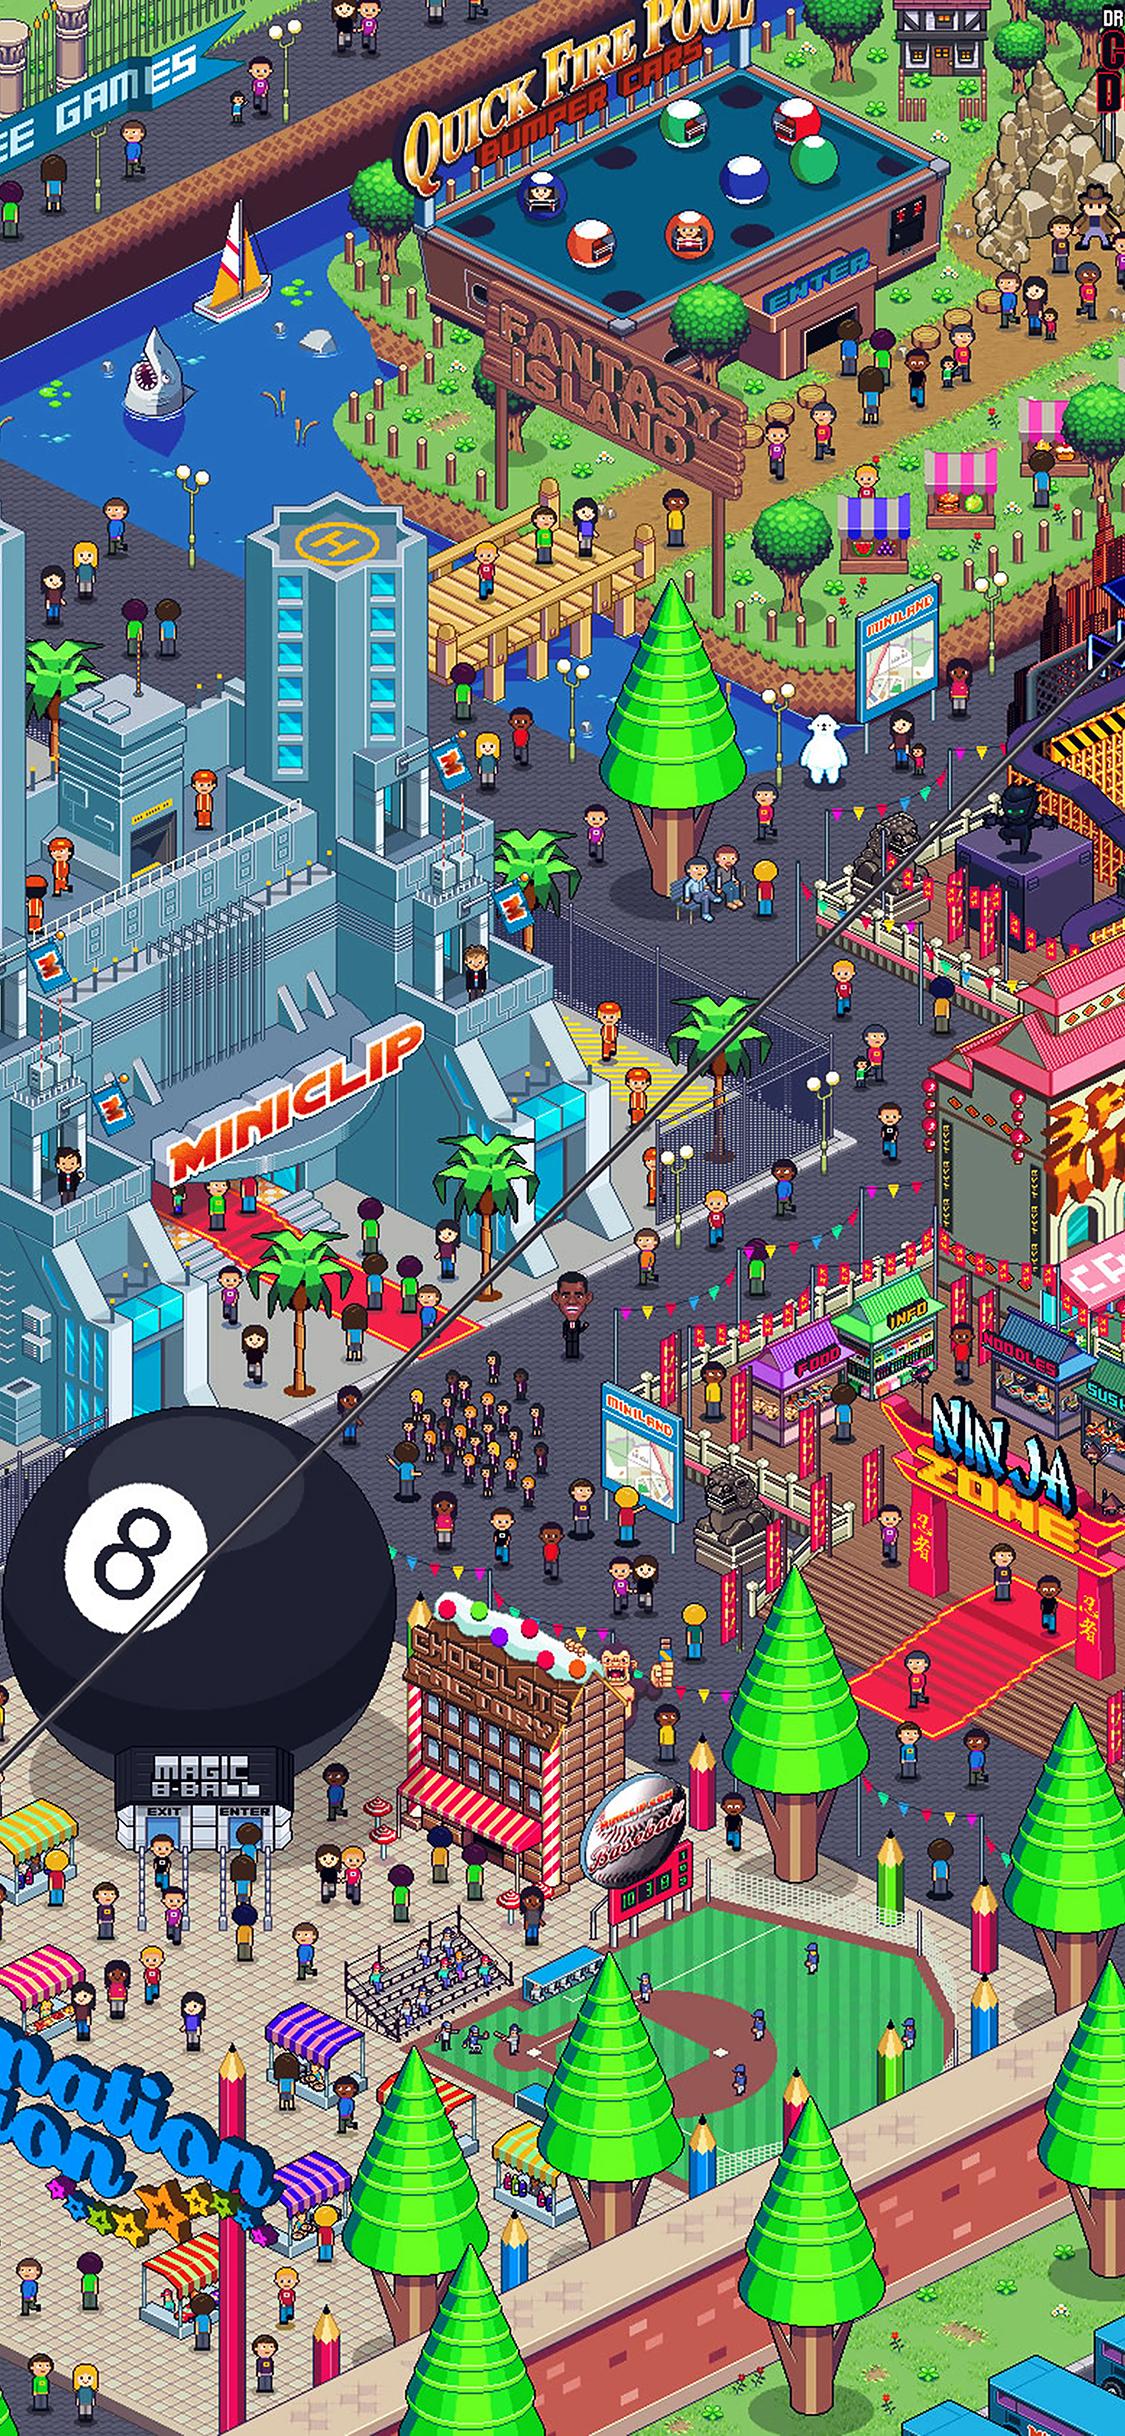 Iphonexpapers Com Iphone X Wallpaper Aj26 Pixel Art City By Army Of Trolls